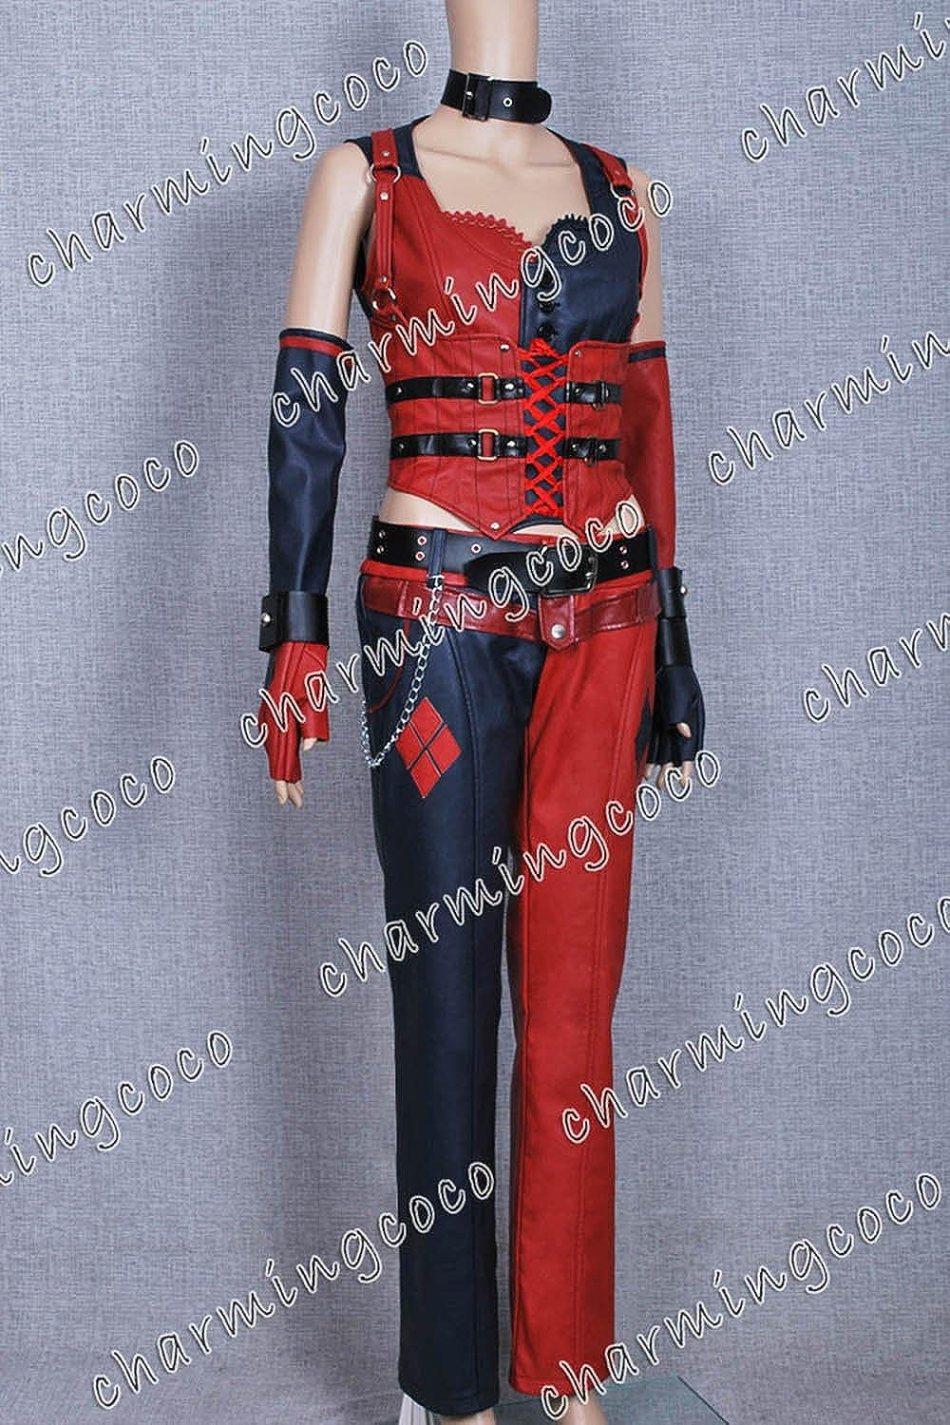 Batman: Arkham City Cosplay Costume Harley Quinn Full Set (Female L)